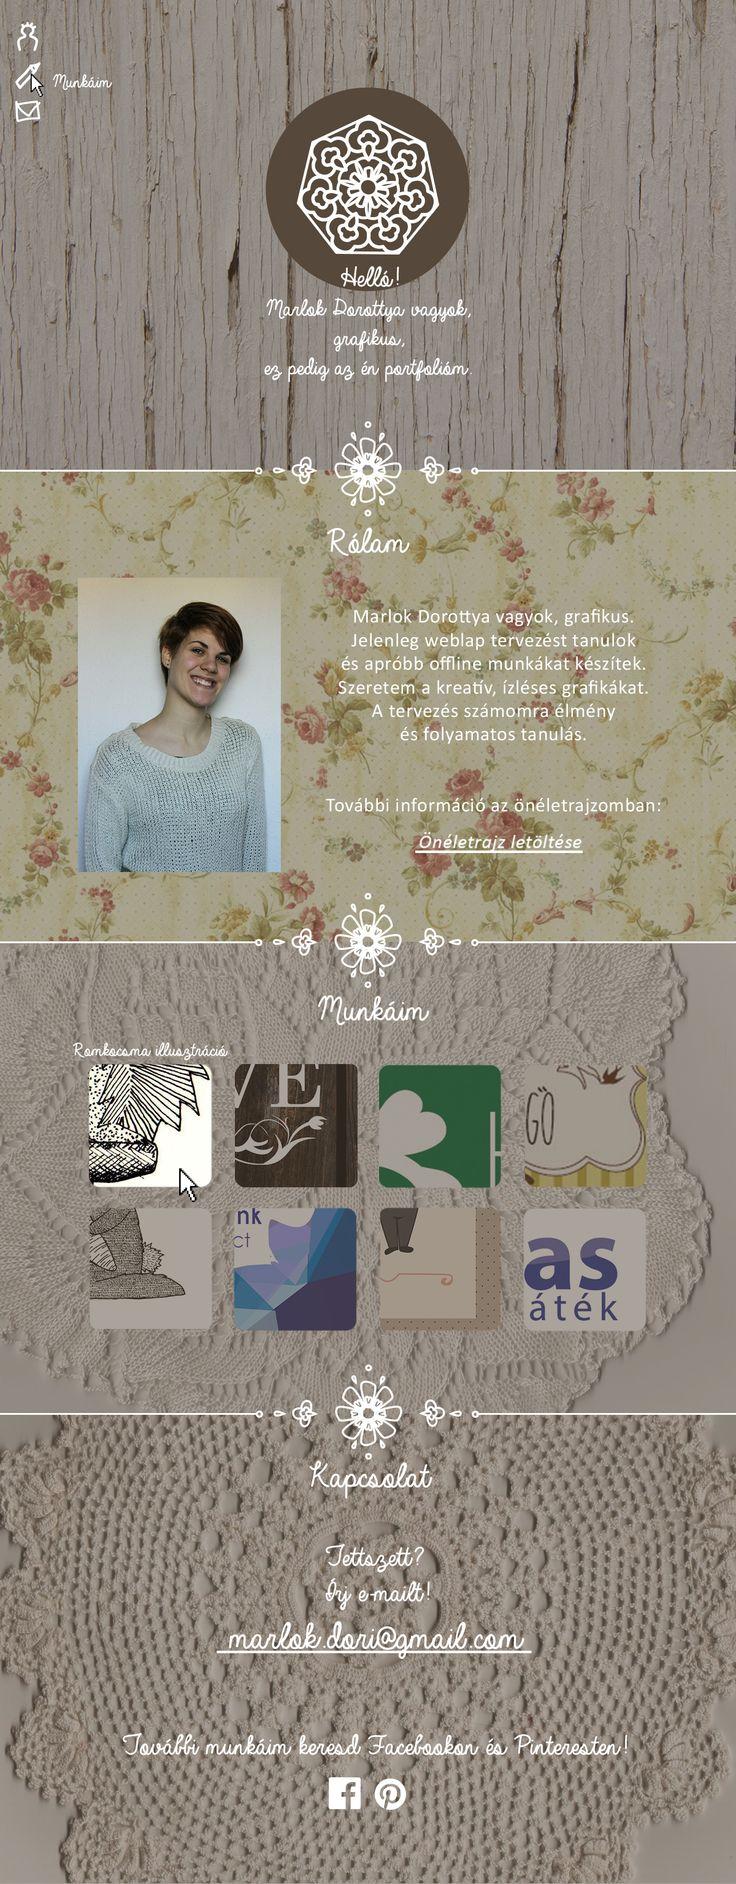 my homepage :)